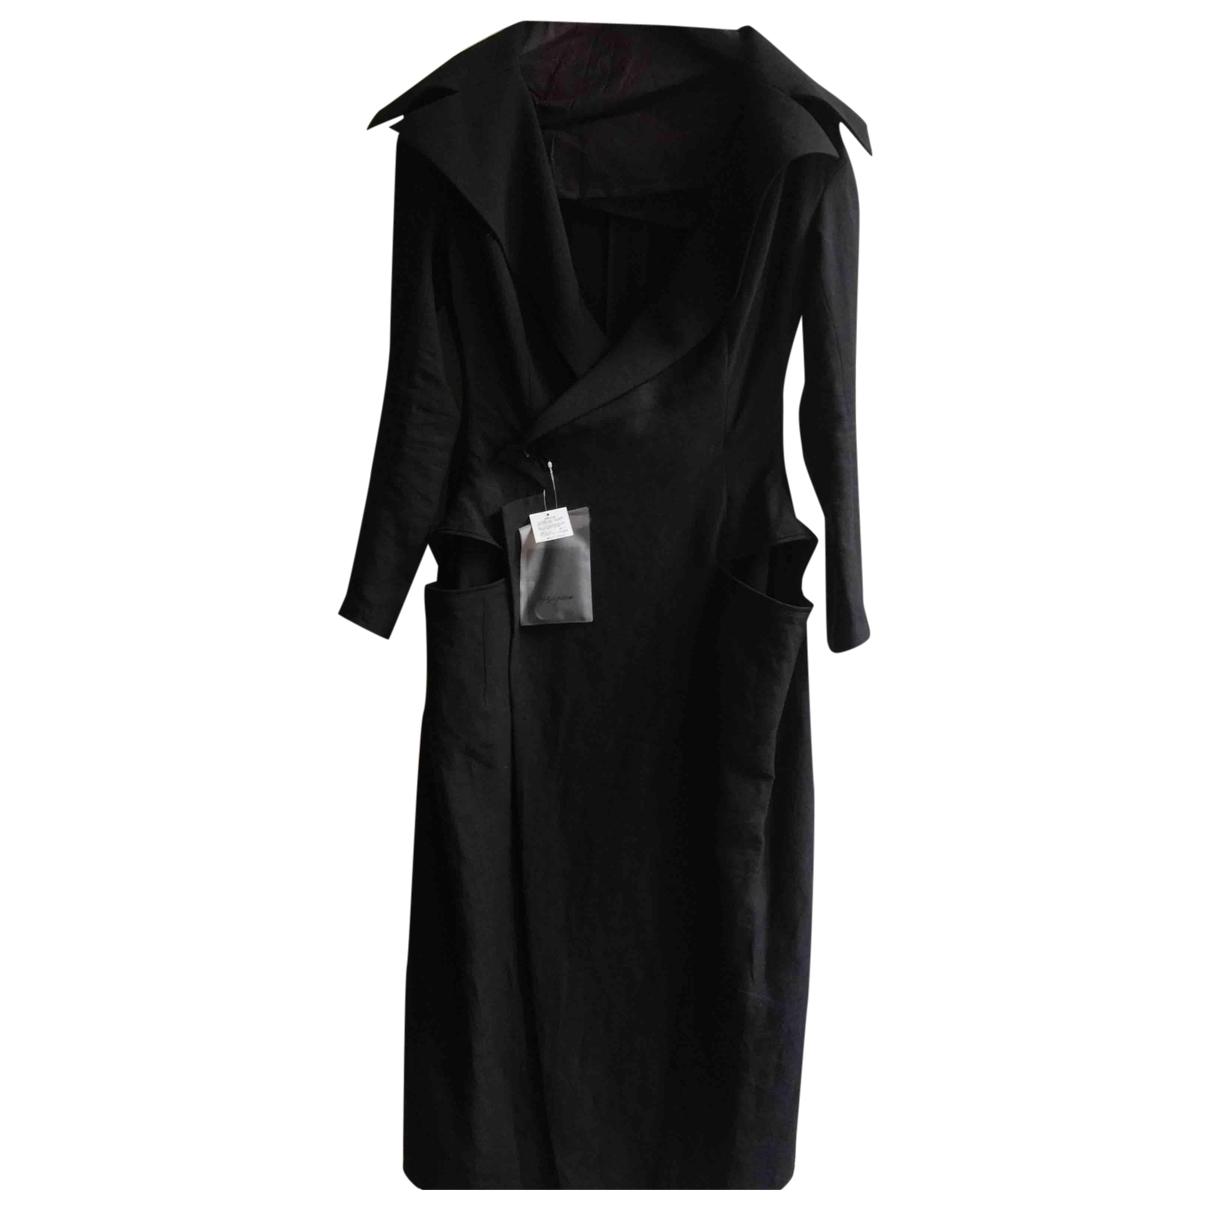 Yohji Yamamoto - Manteau   pour femme en lin - noir